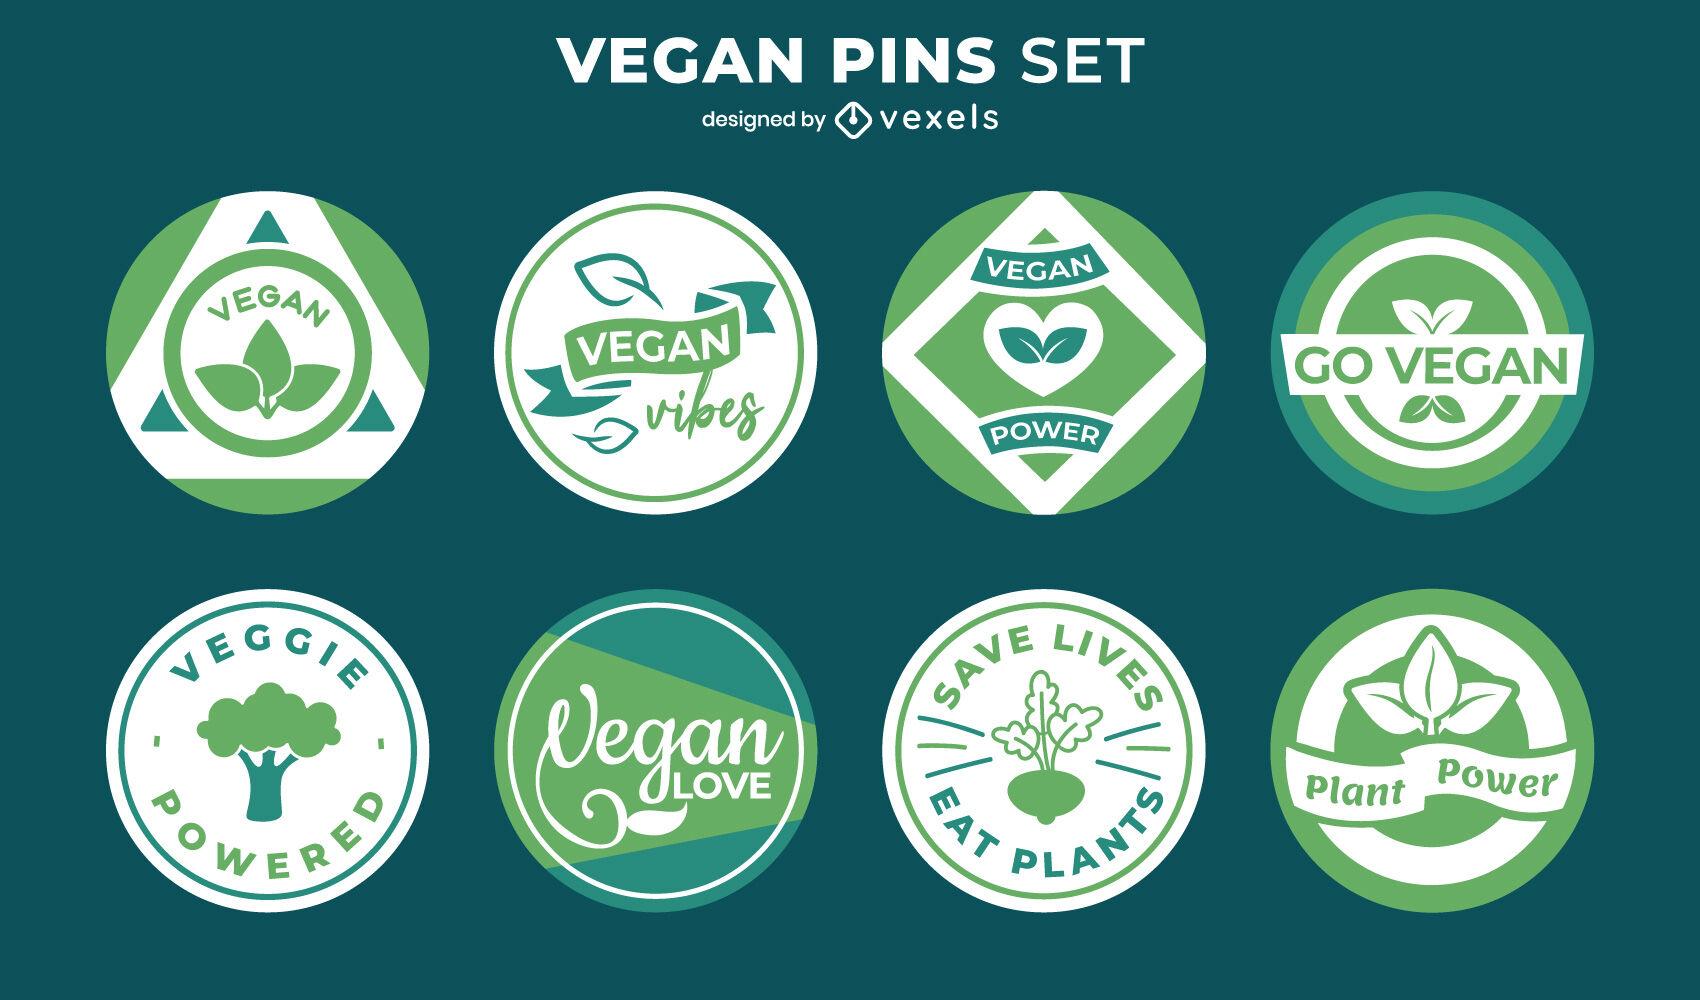 Vegan healthy natural food green pin set